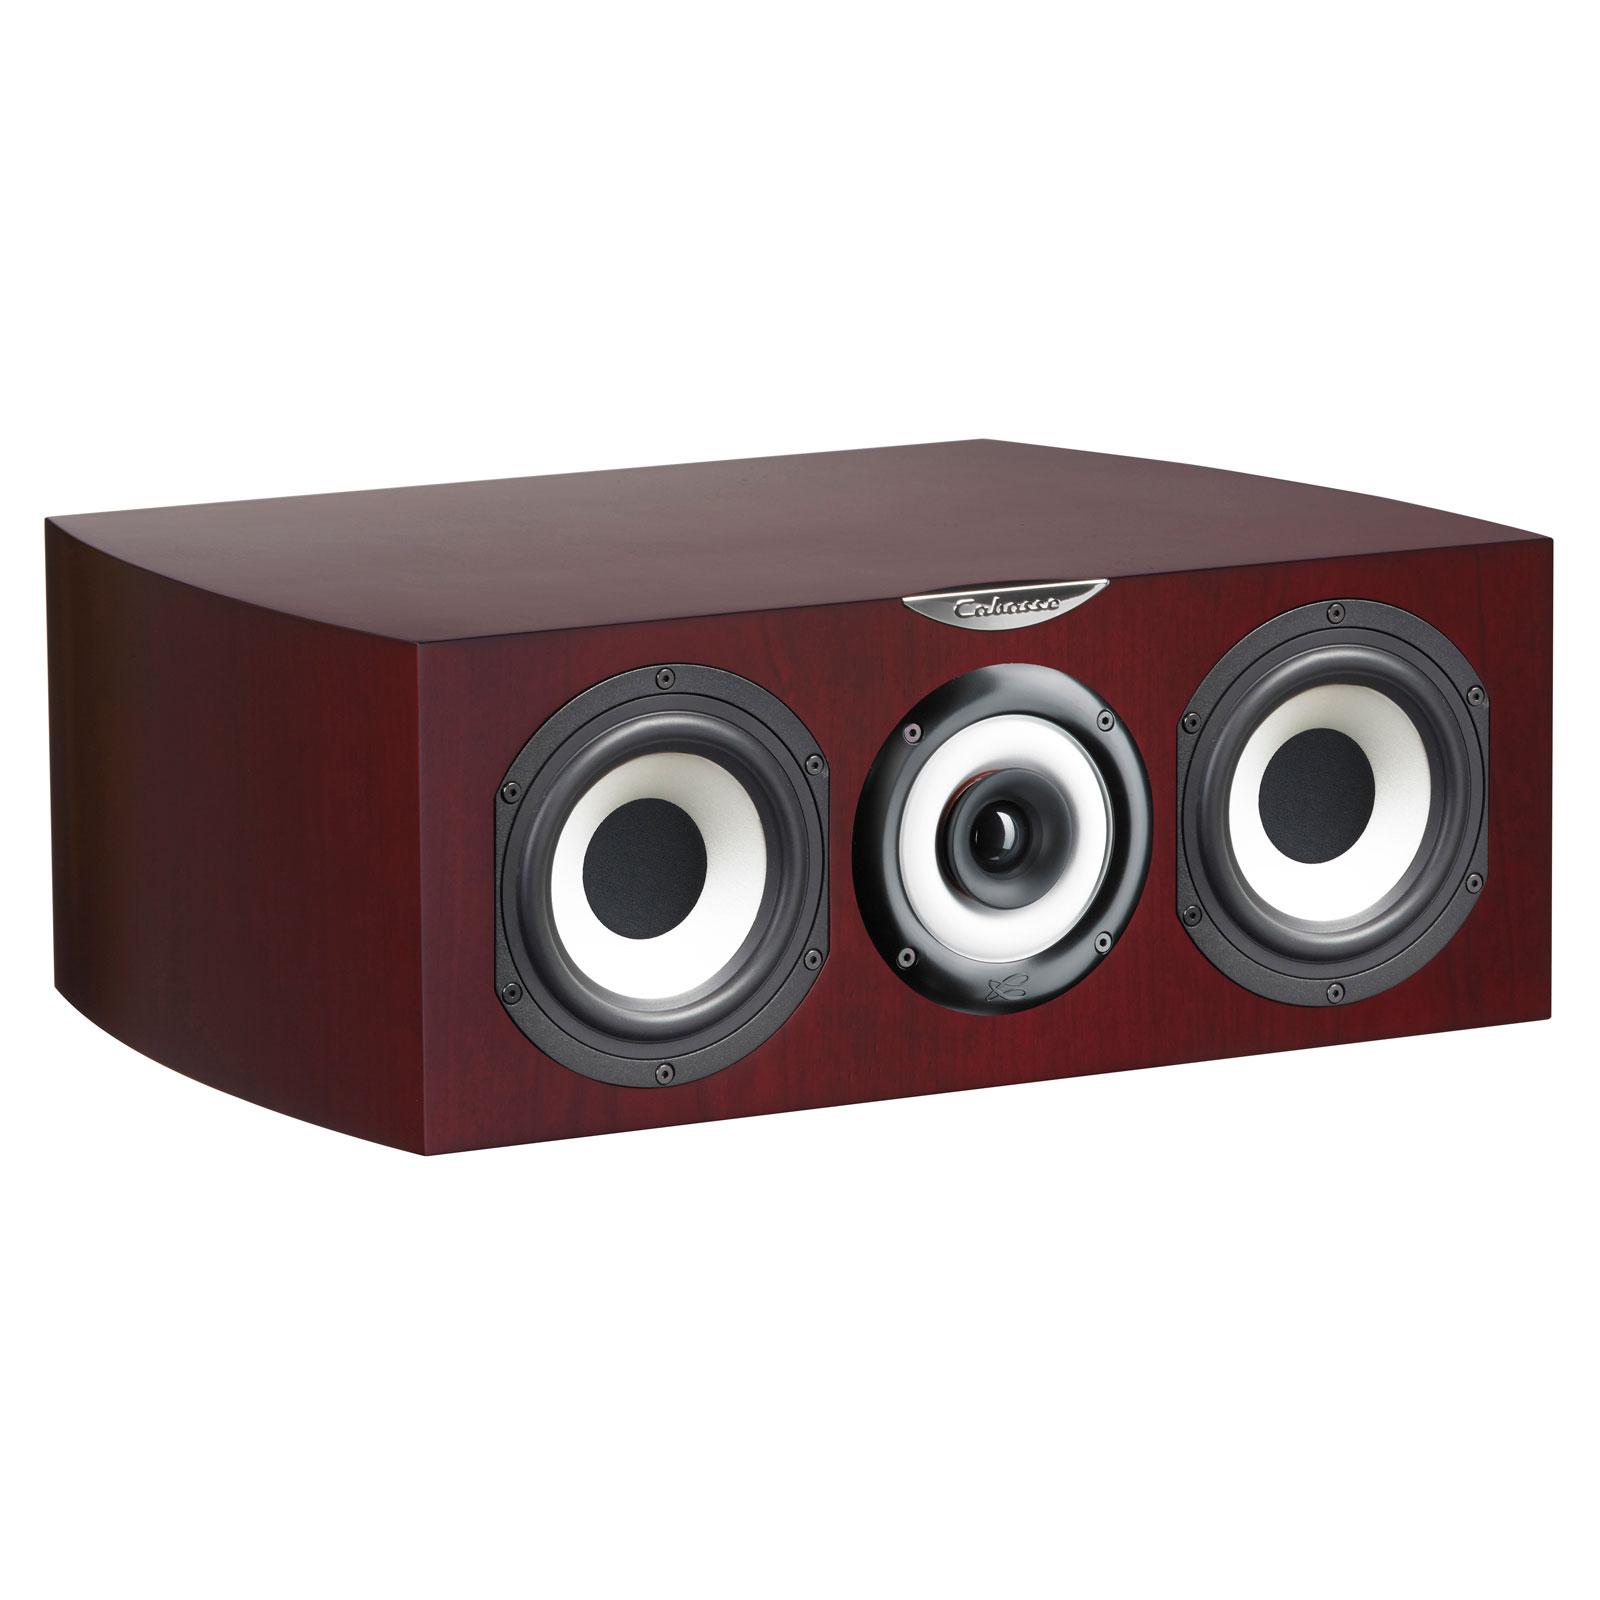 cabasse cabrera mc40 cerisier rouge enceintes hifi cabasse sur. Black Bedroom Furniture Sets. Home Design Ideas